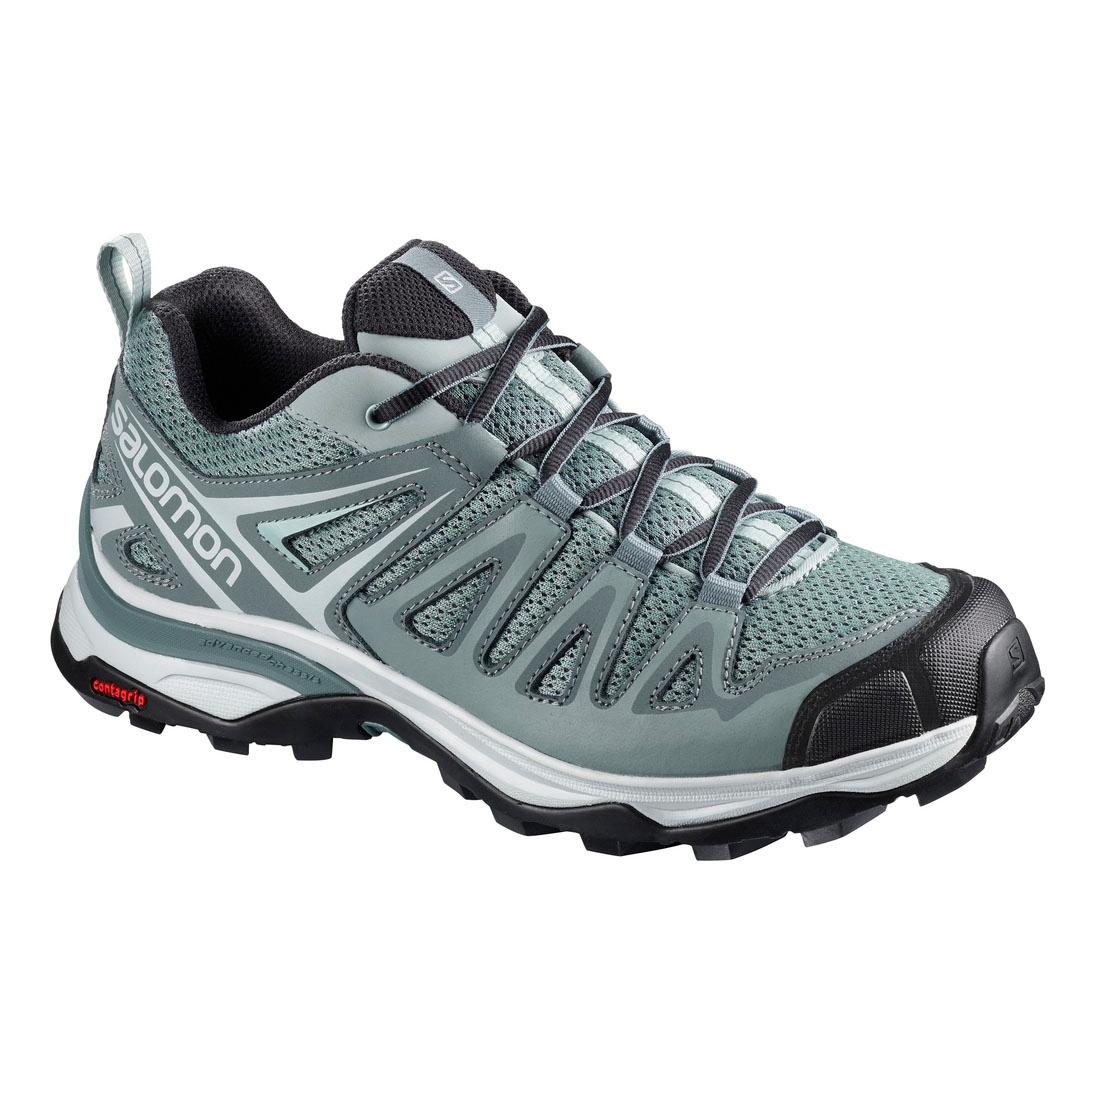 Image of Salomon X Ultra 3 Prime GTX Walking Shoes (Women's) - Lead/ ...